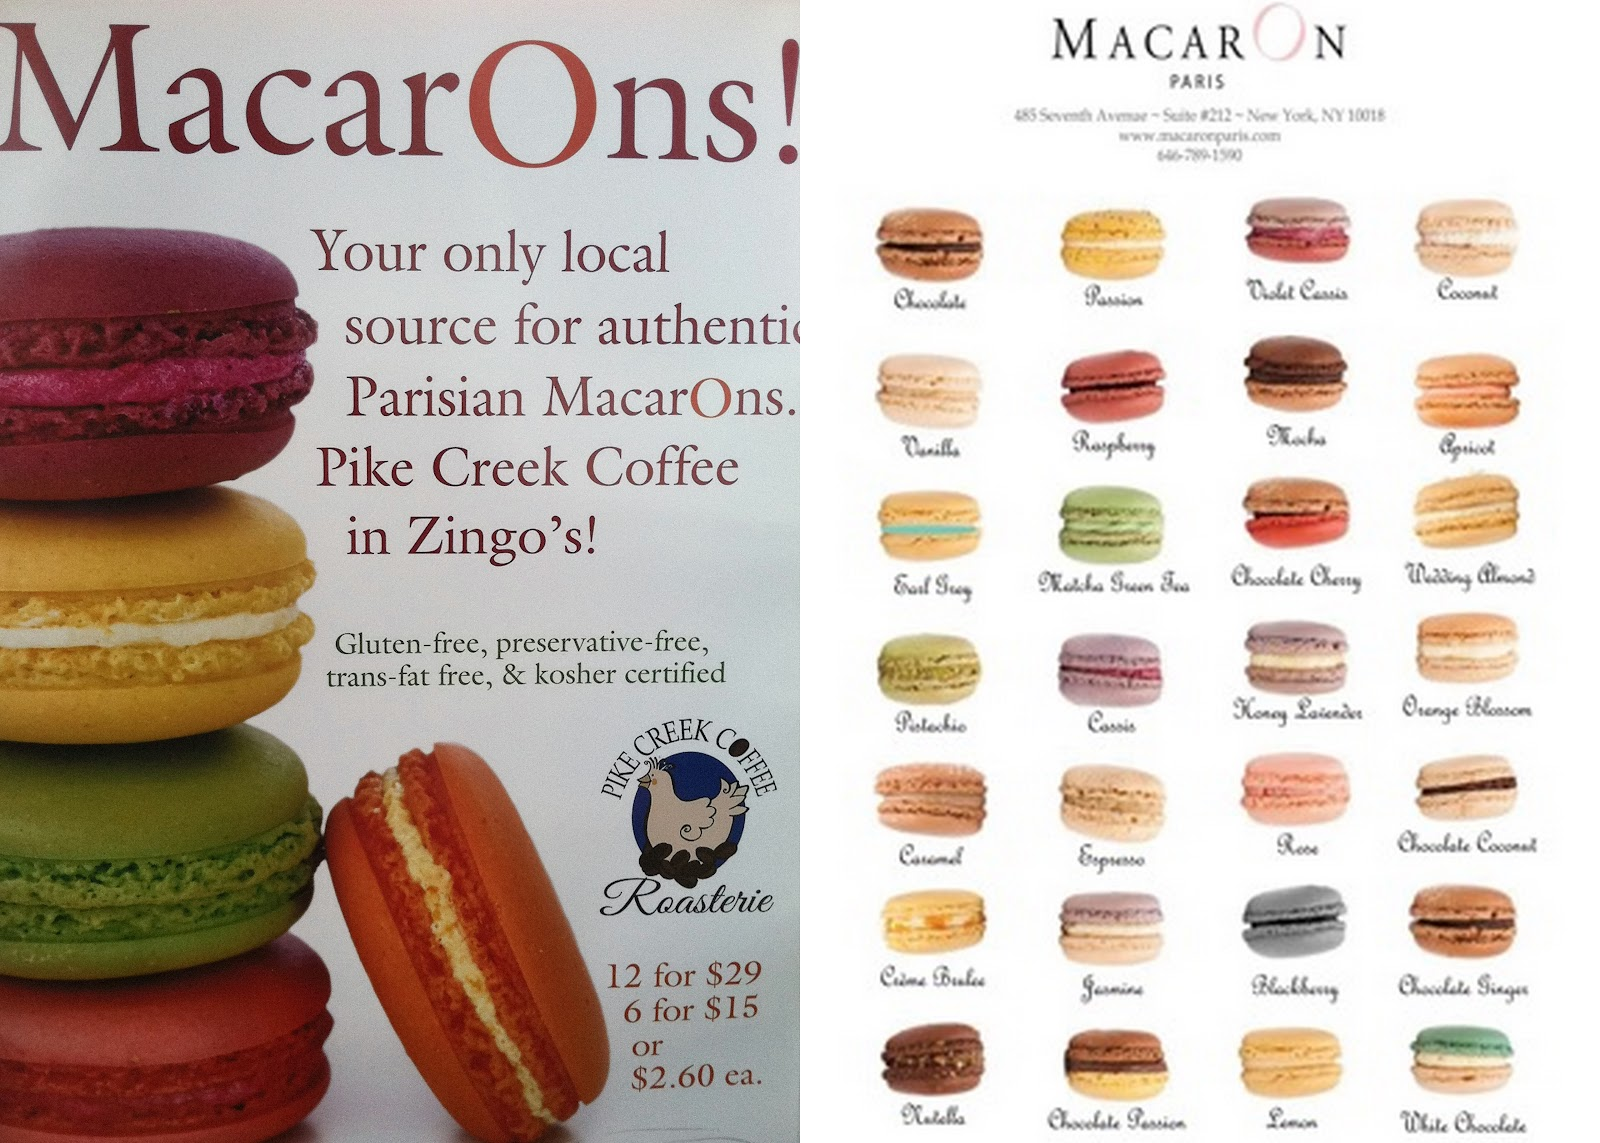 Macaron Cafe Nyc Menu